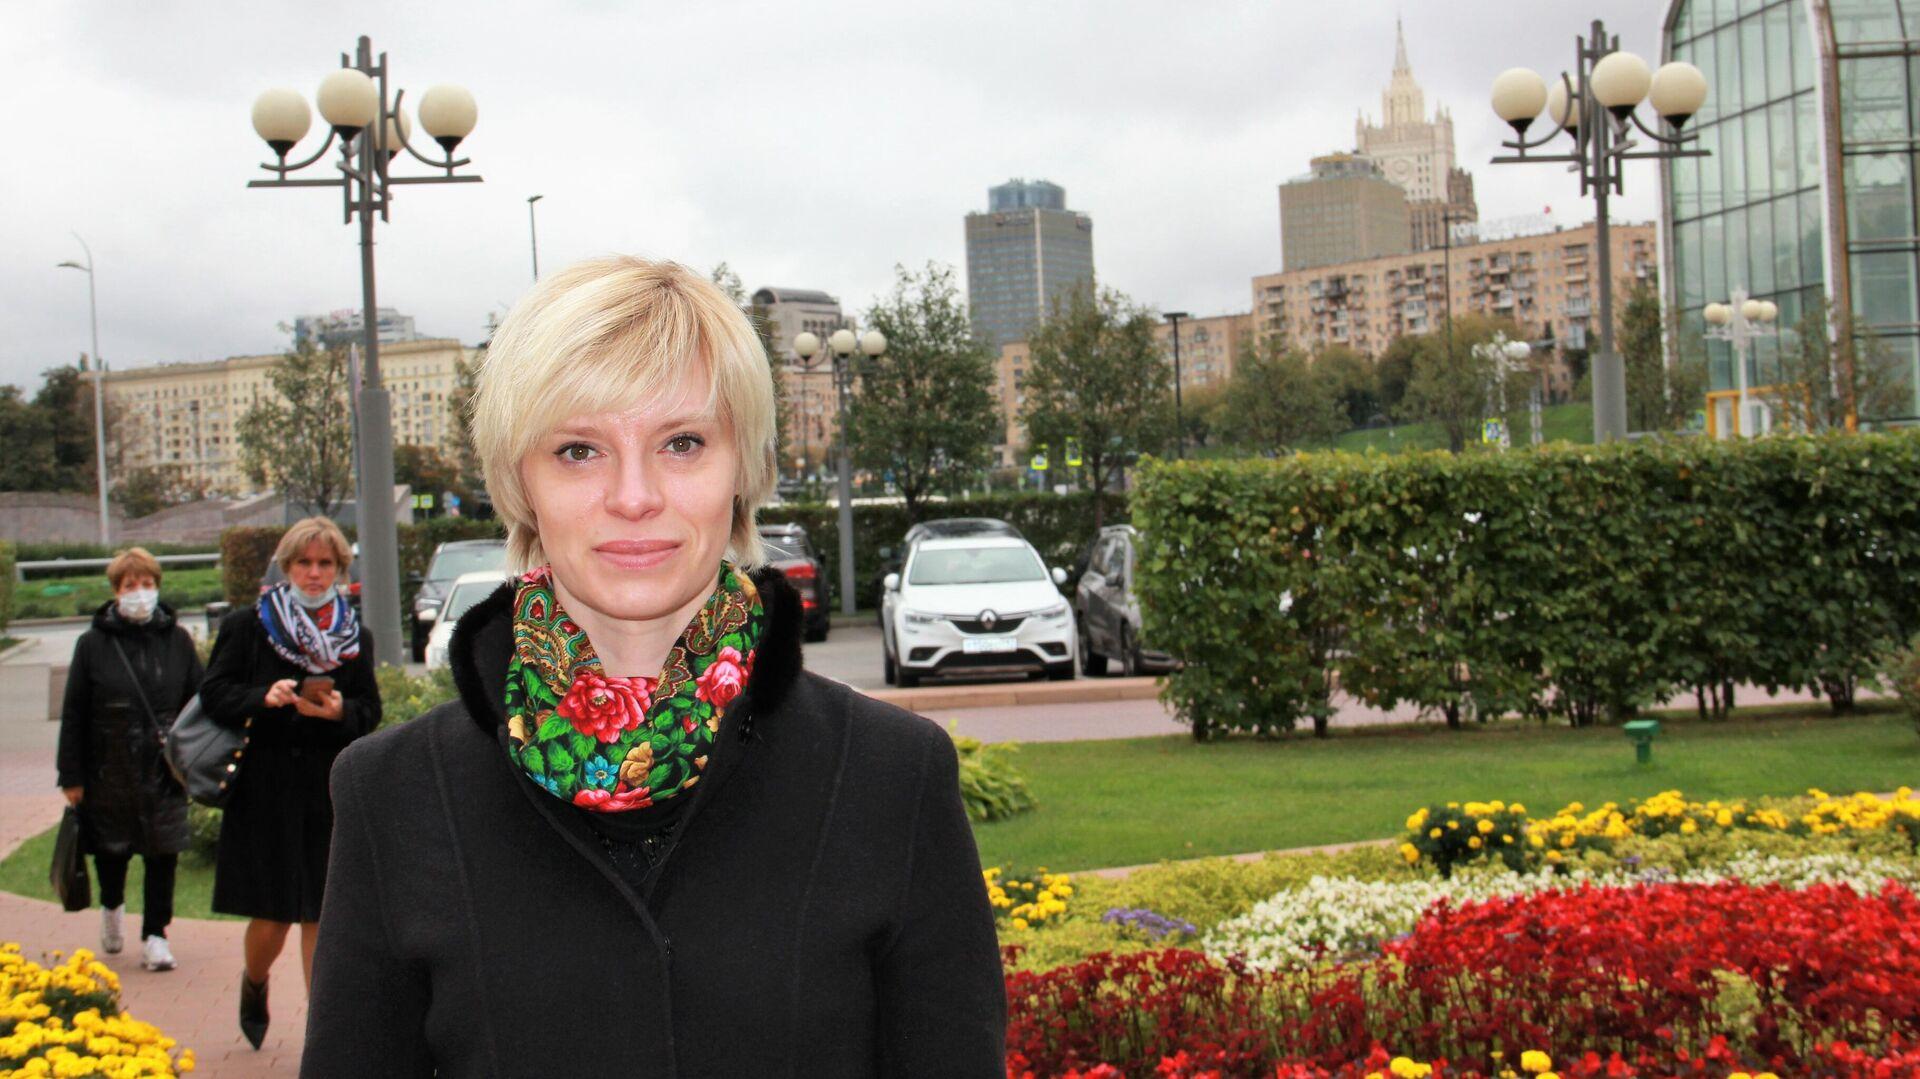 Olga Petersen am Europa-Platz in Moskau - SNA, 1920, 18.09.2021